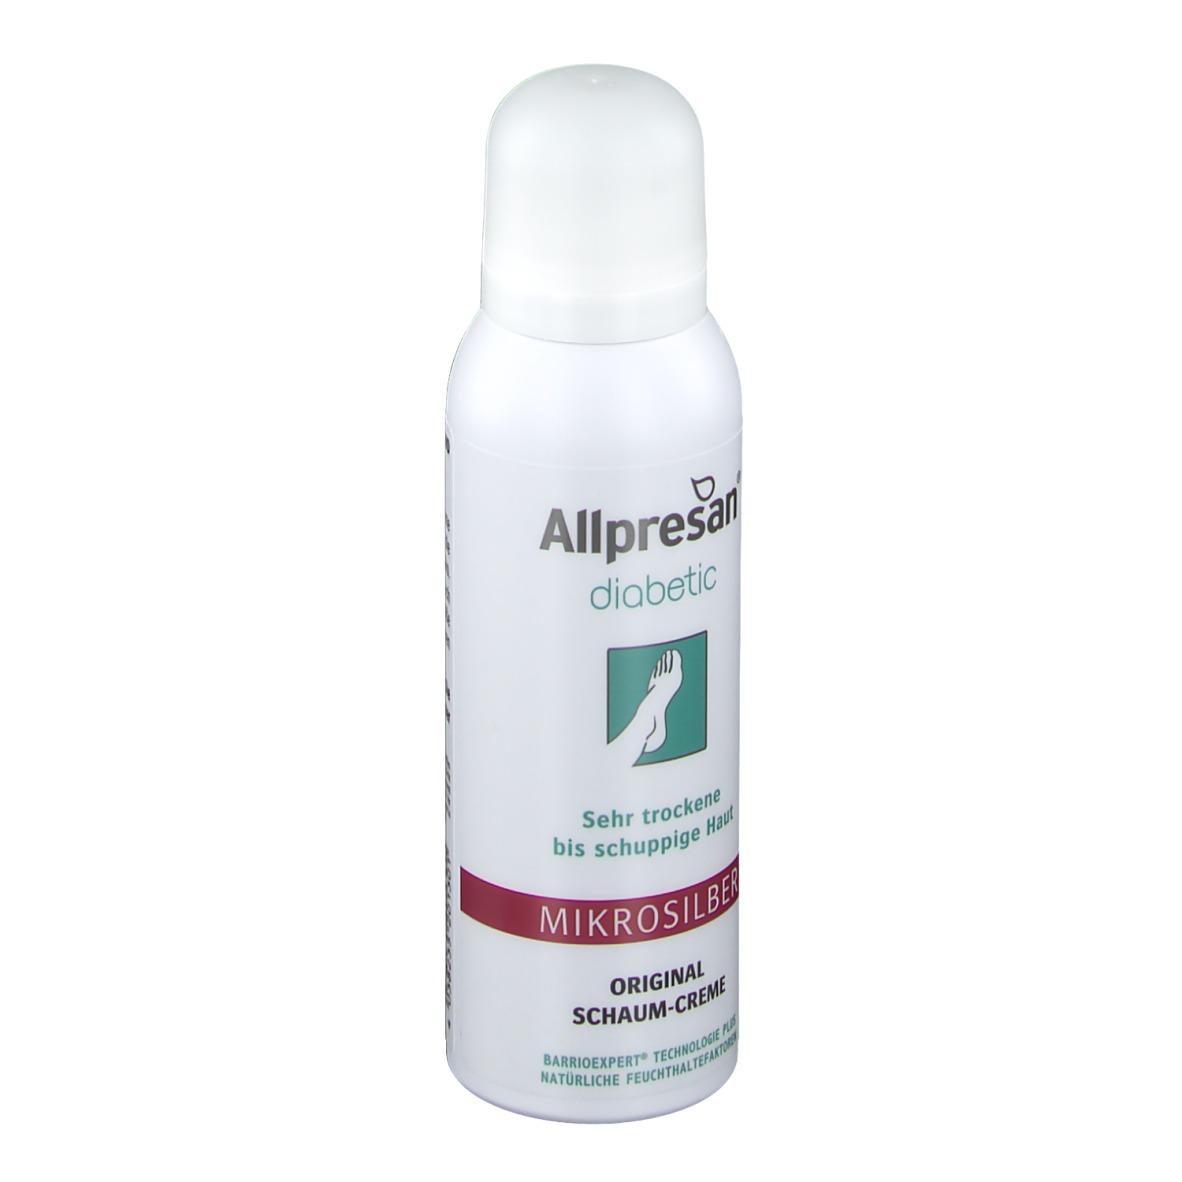 Allpresan diabetic Intensivpflege plus Mikrosilber 200 ml